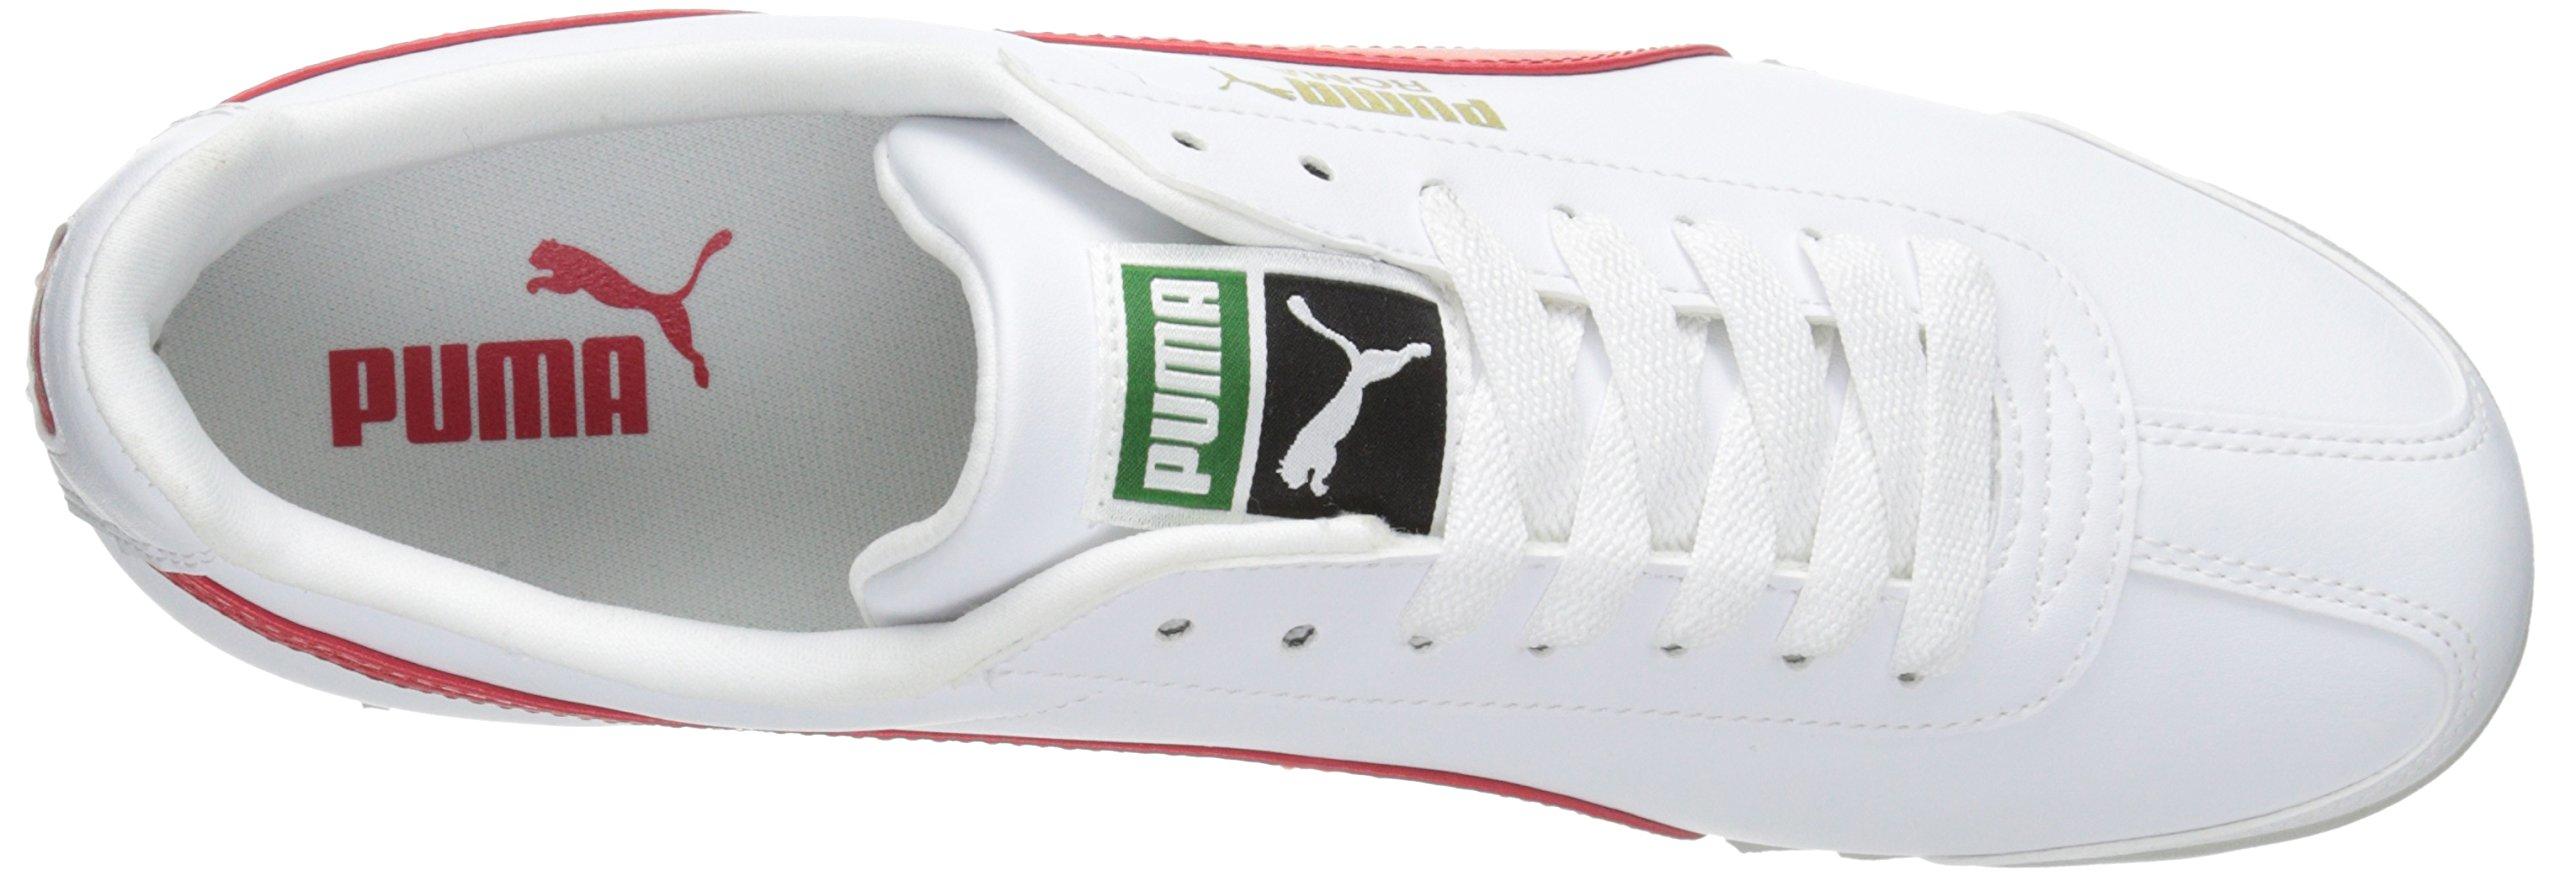 PUMA Men's Roma Basic Fashion Sneaker, White/High Risk Red/White - 9 D(M) US by PUMA (Image #8)